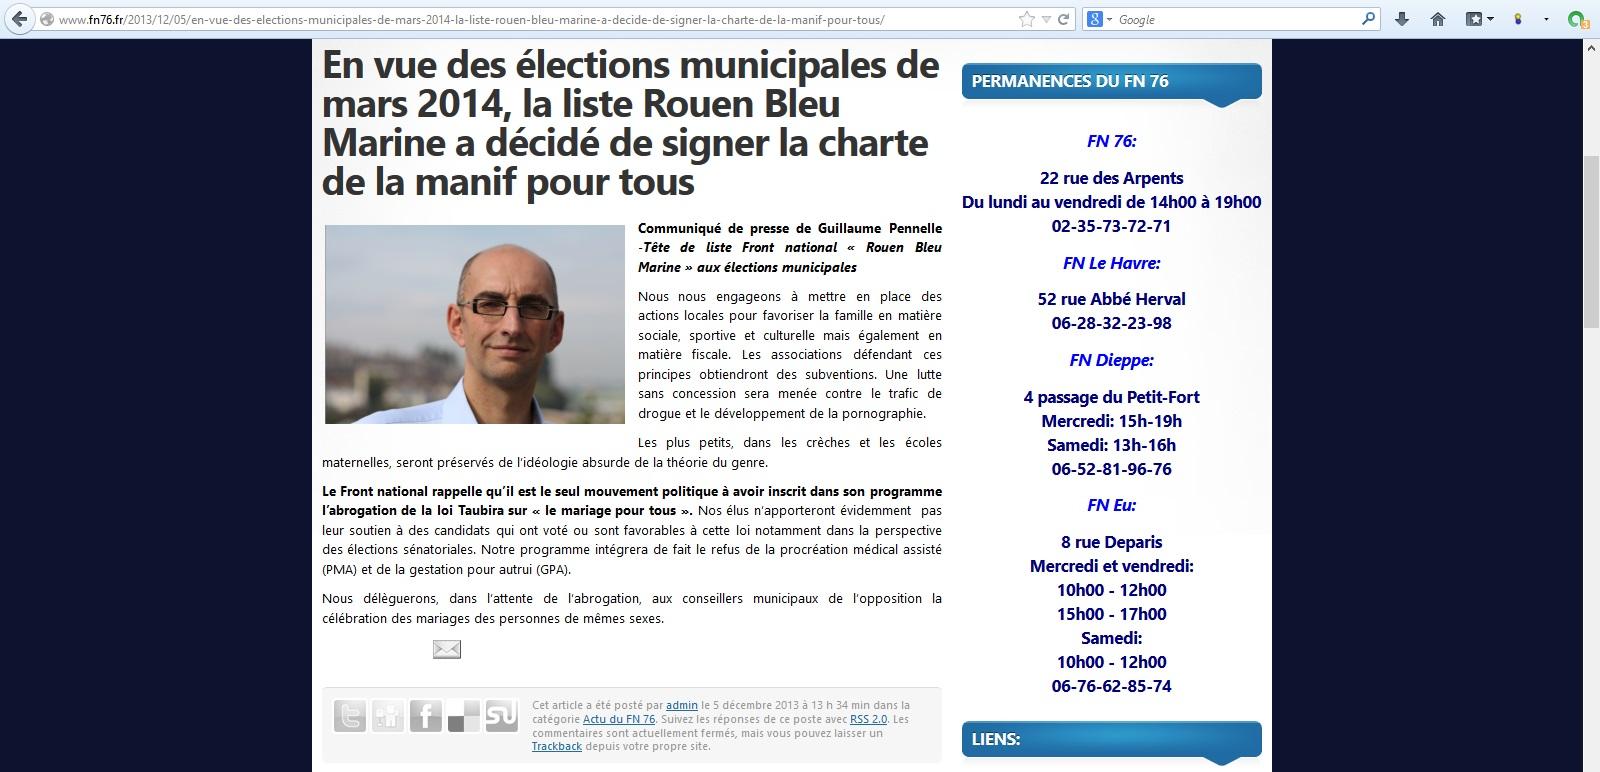 FN_Theorie_du_genre-Seine-Maritime